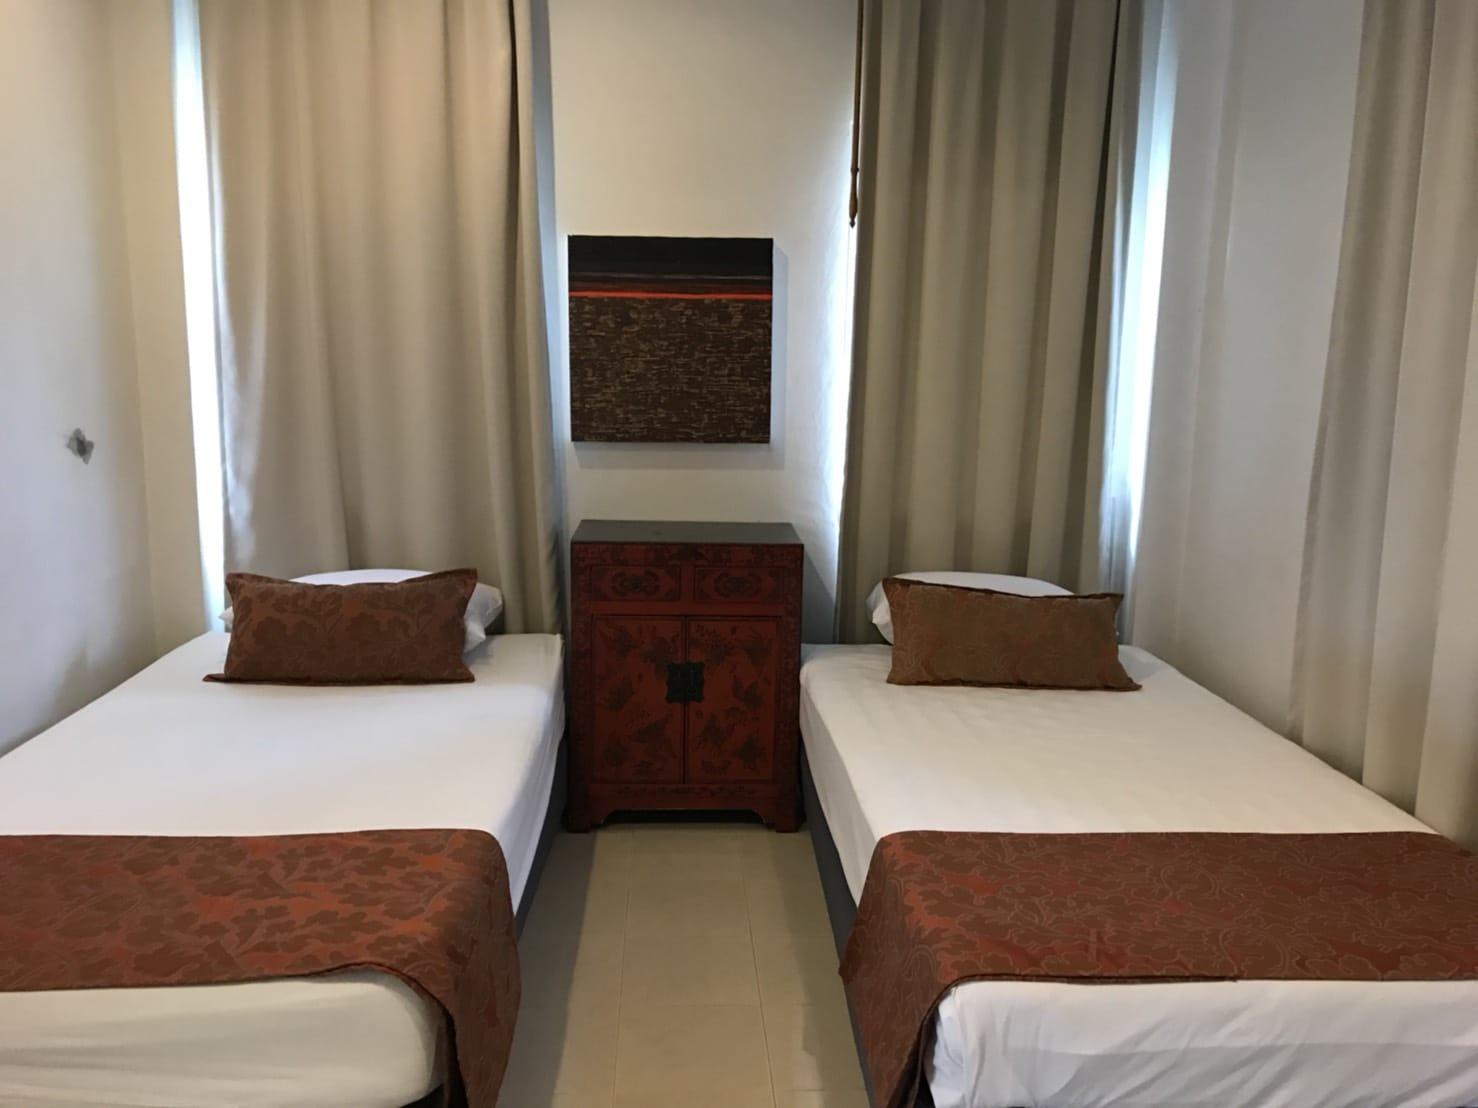 Cherng Talay 2 Bedroom -09deb7b9-fcd7-41c5-9b03-3b2e024d625a.jpg